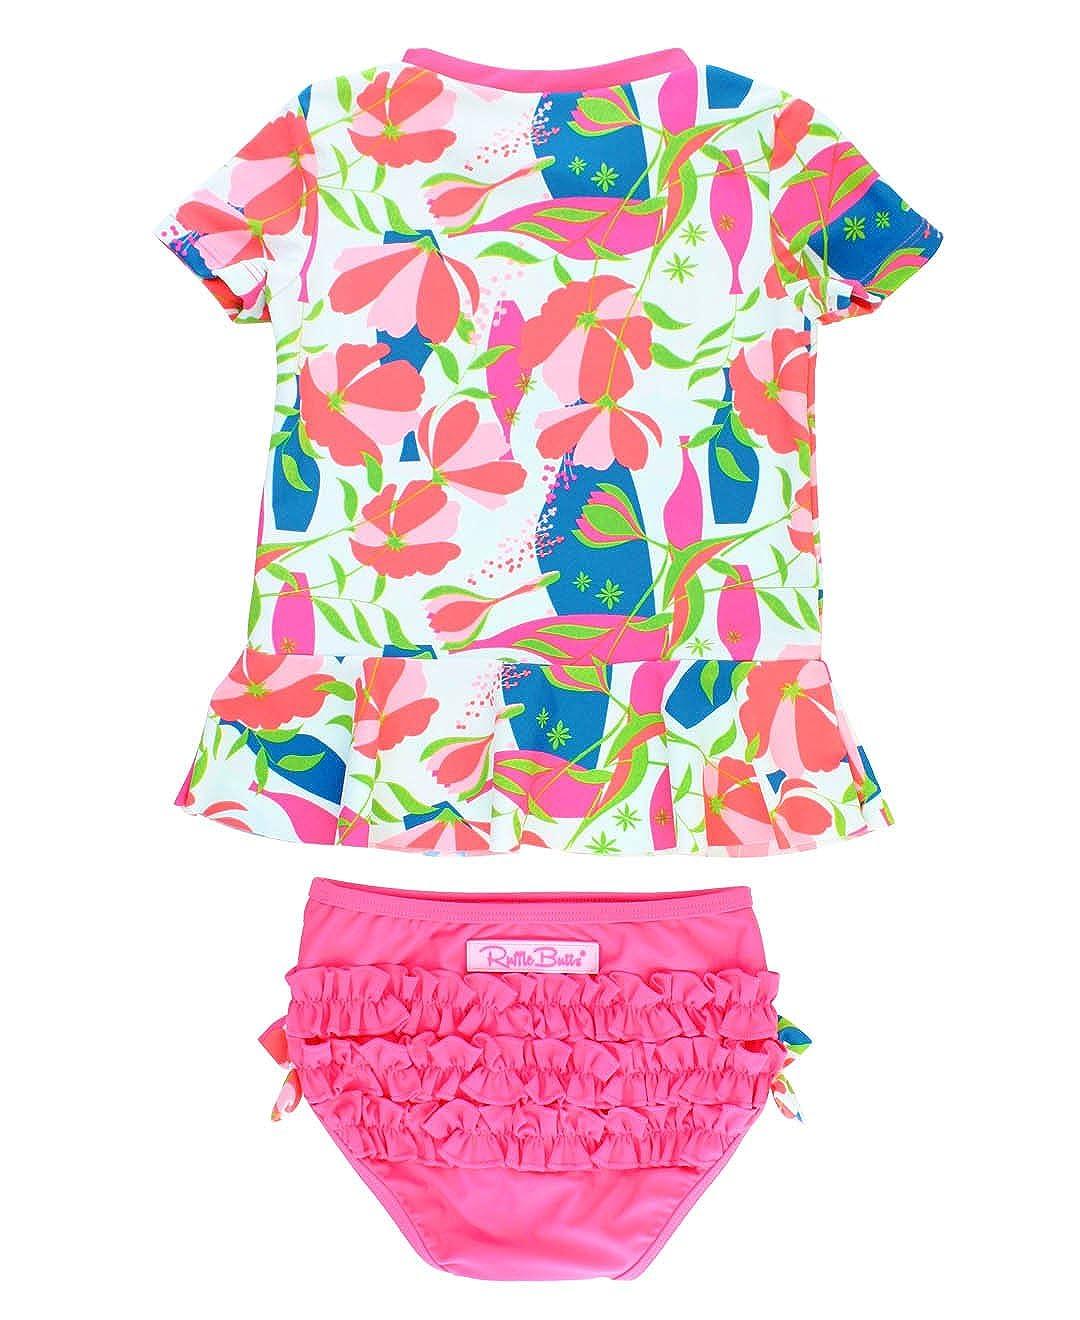 RuffleButts Little Girls Rash Guard 2-Piece Swimsuit Set - Floral Peplum Bikini with UPF 50+ Sun Protection RGSCAXX-JSFL-TDLR